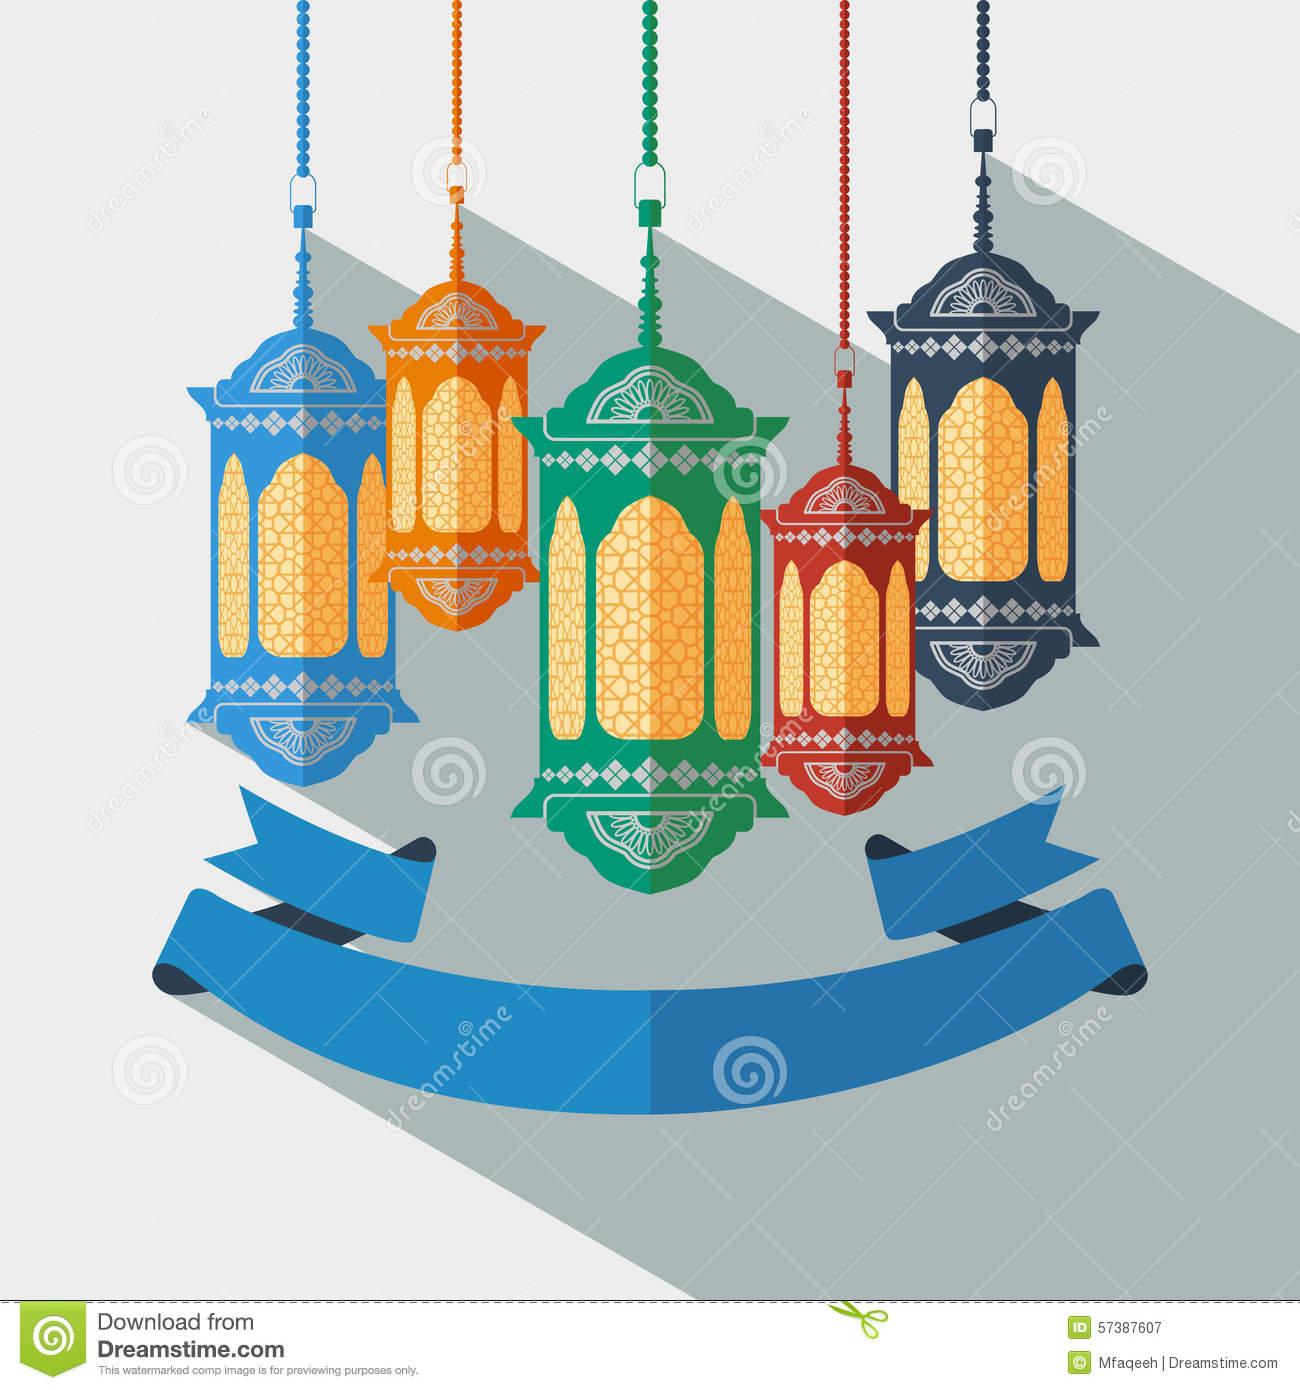 Arabic Lantern And Ribbon Stock Vector.